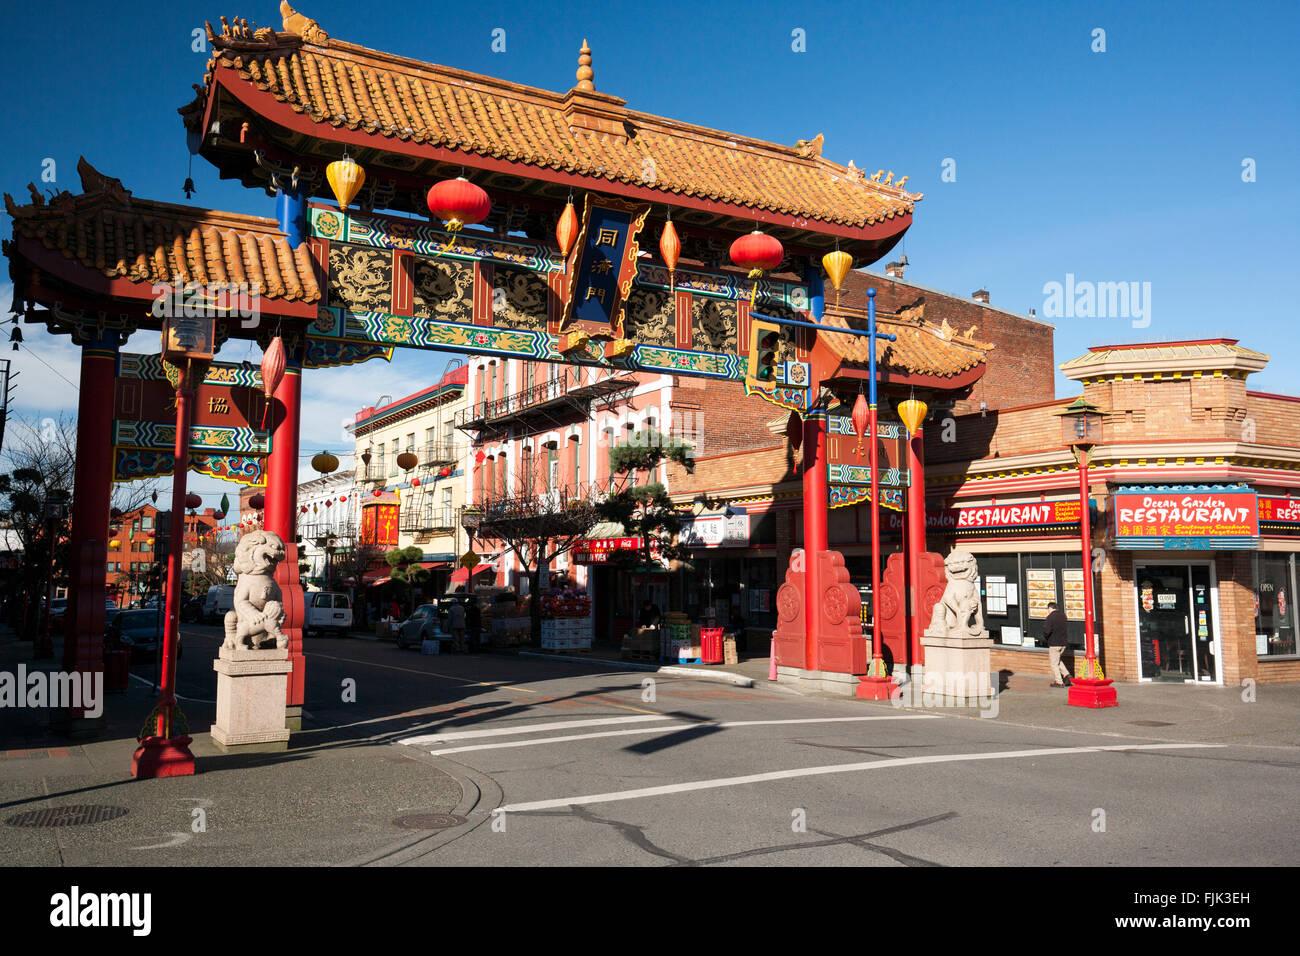 Chinatown Gate - Victoria, Vancouver Island, British Columbia, Canada - Stock Image